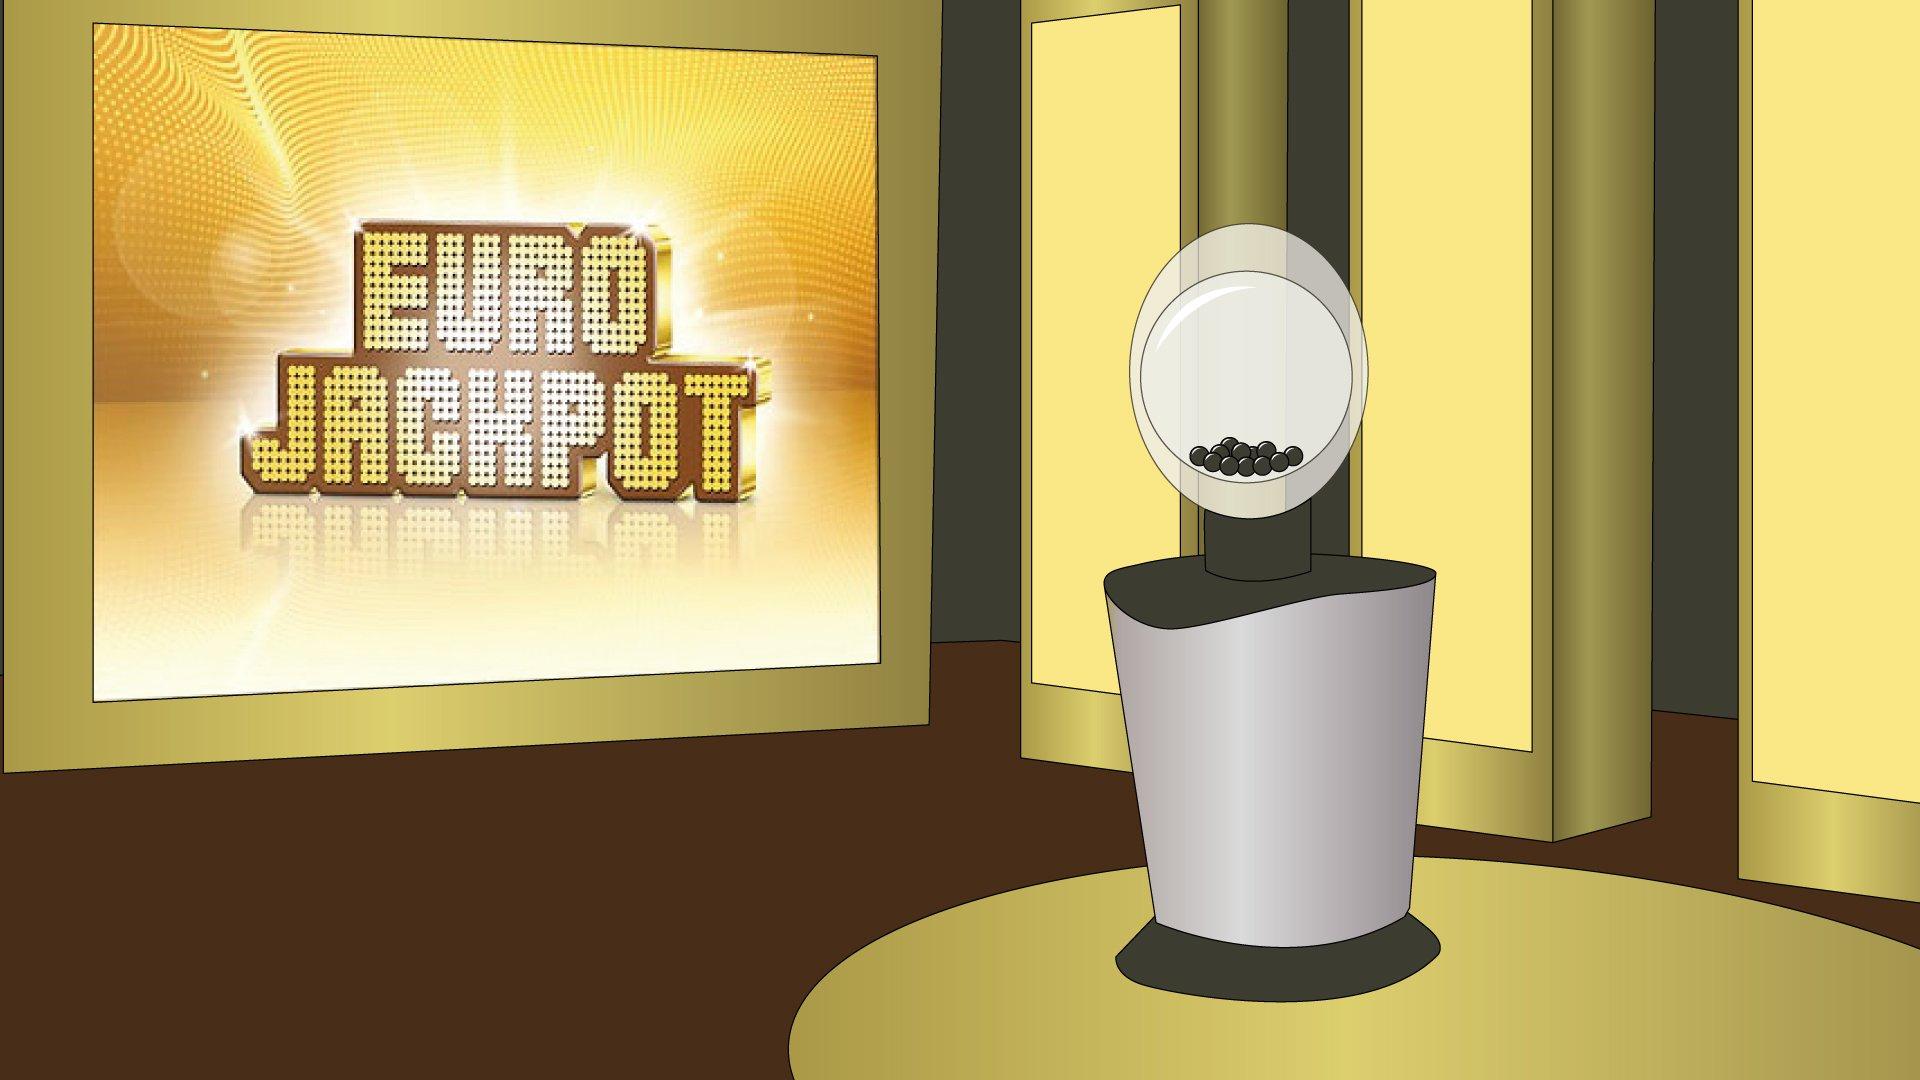 Eurojackpot 01.11.19